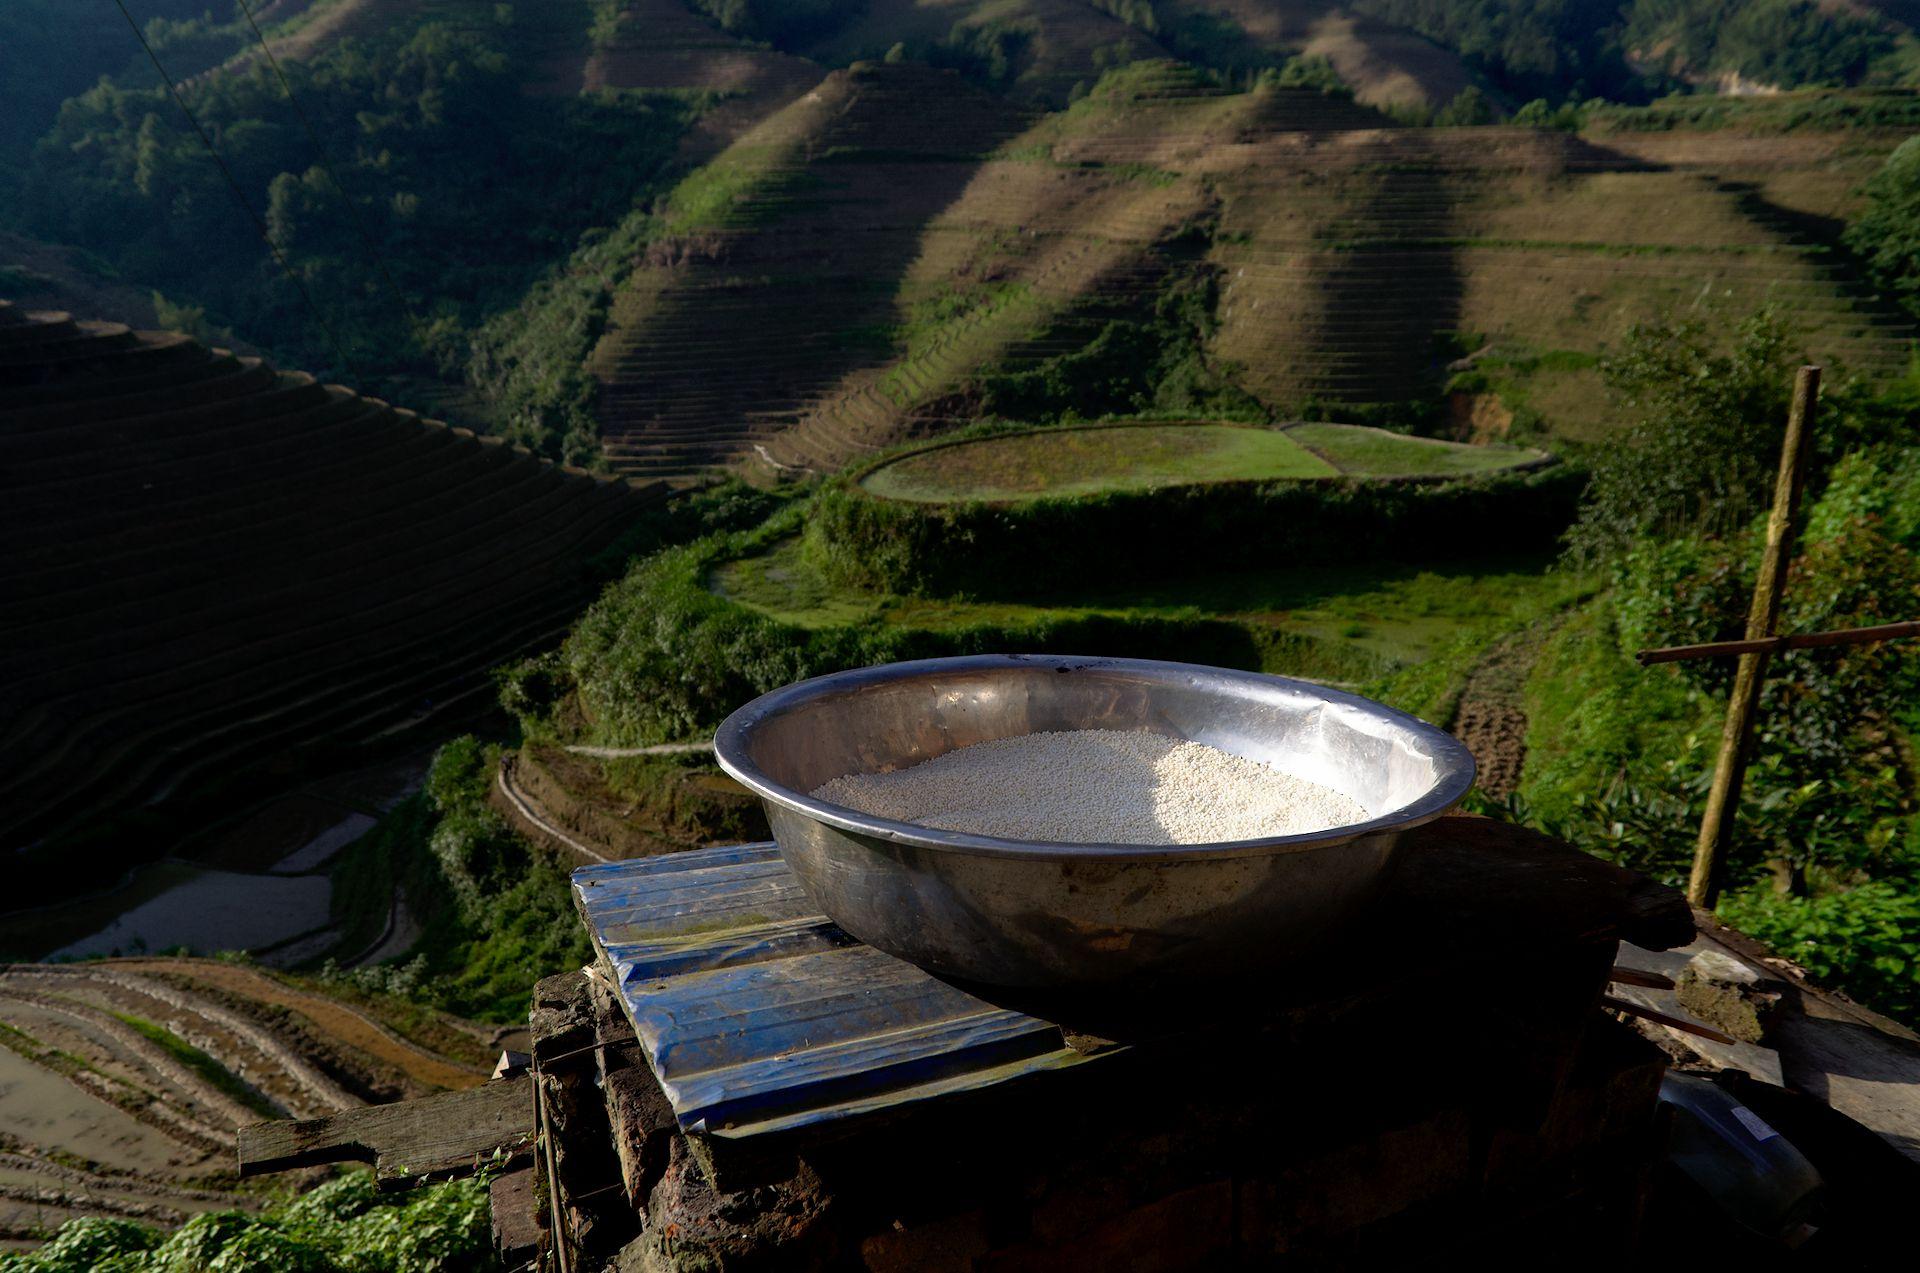 Los arrozales de Longsheng